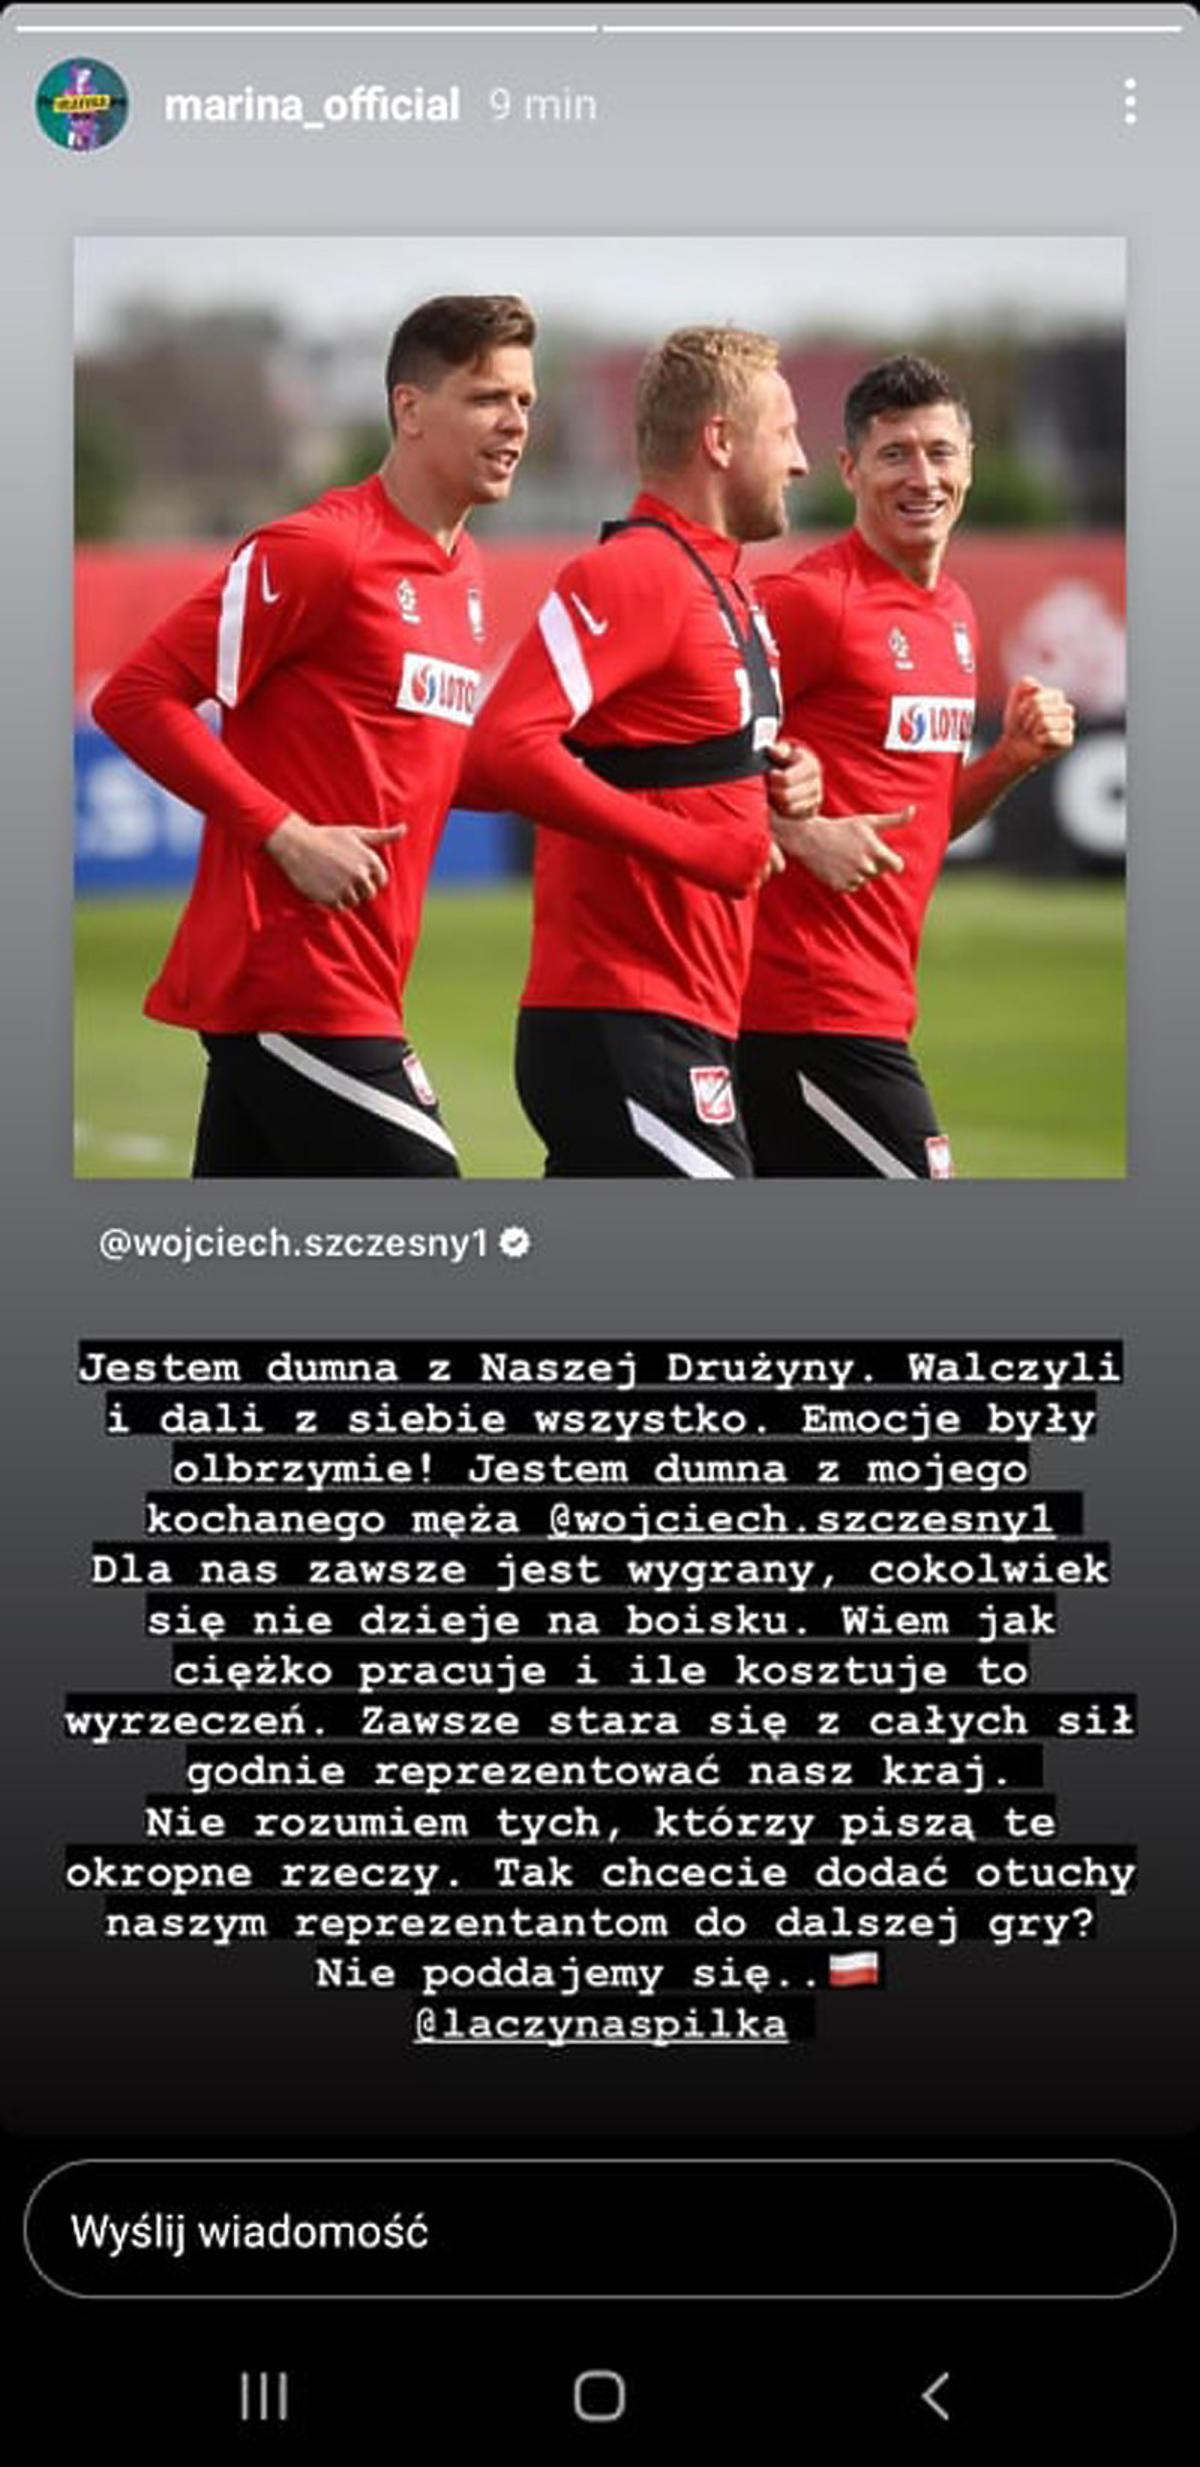 Marina broni polskiej reprezentacji